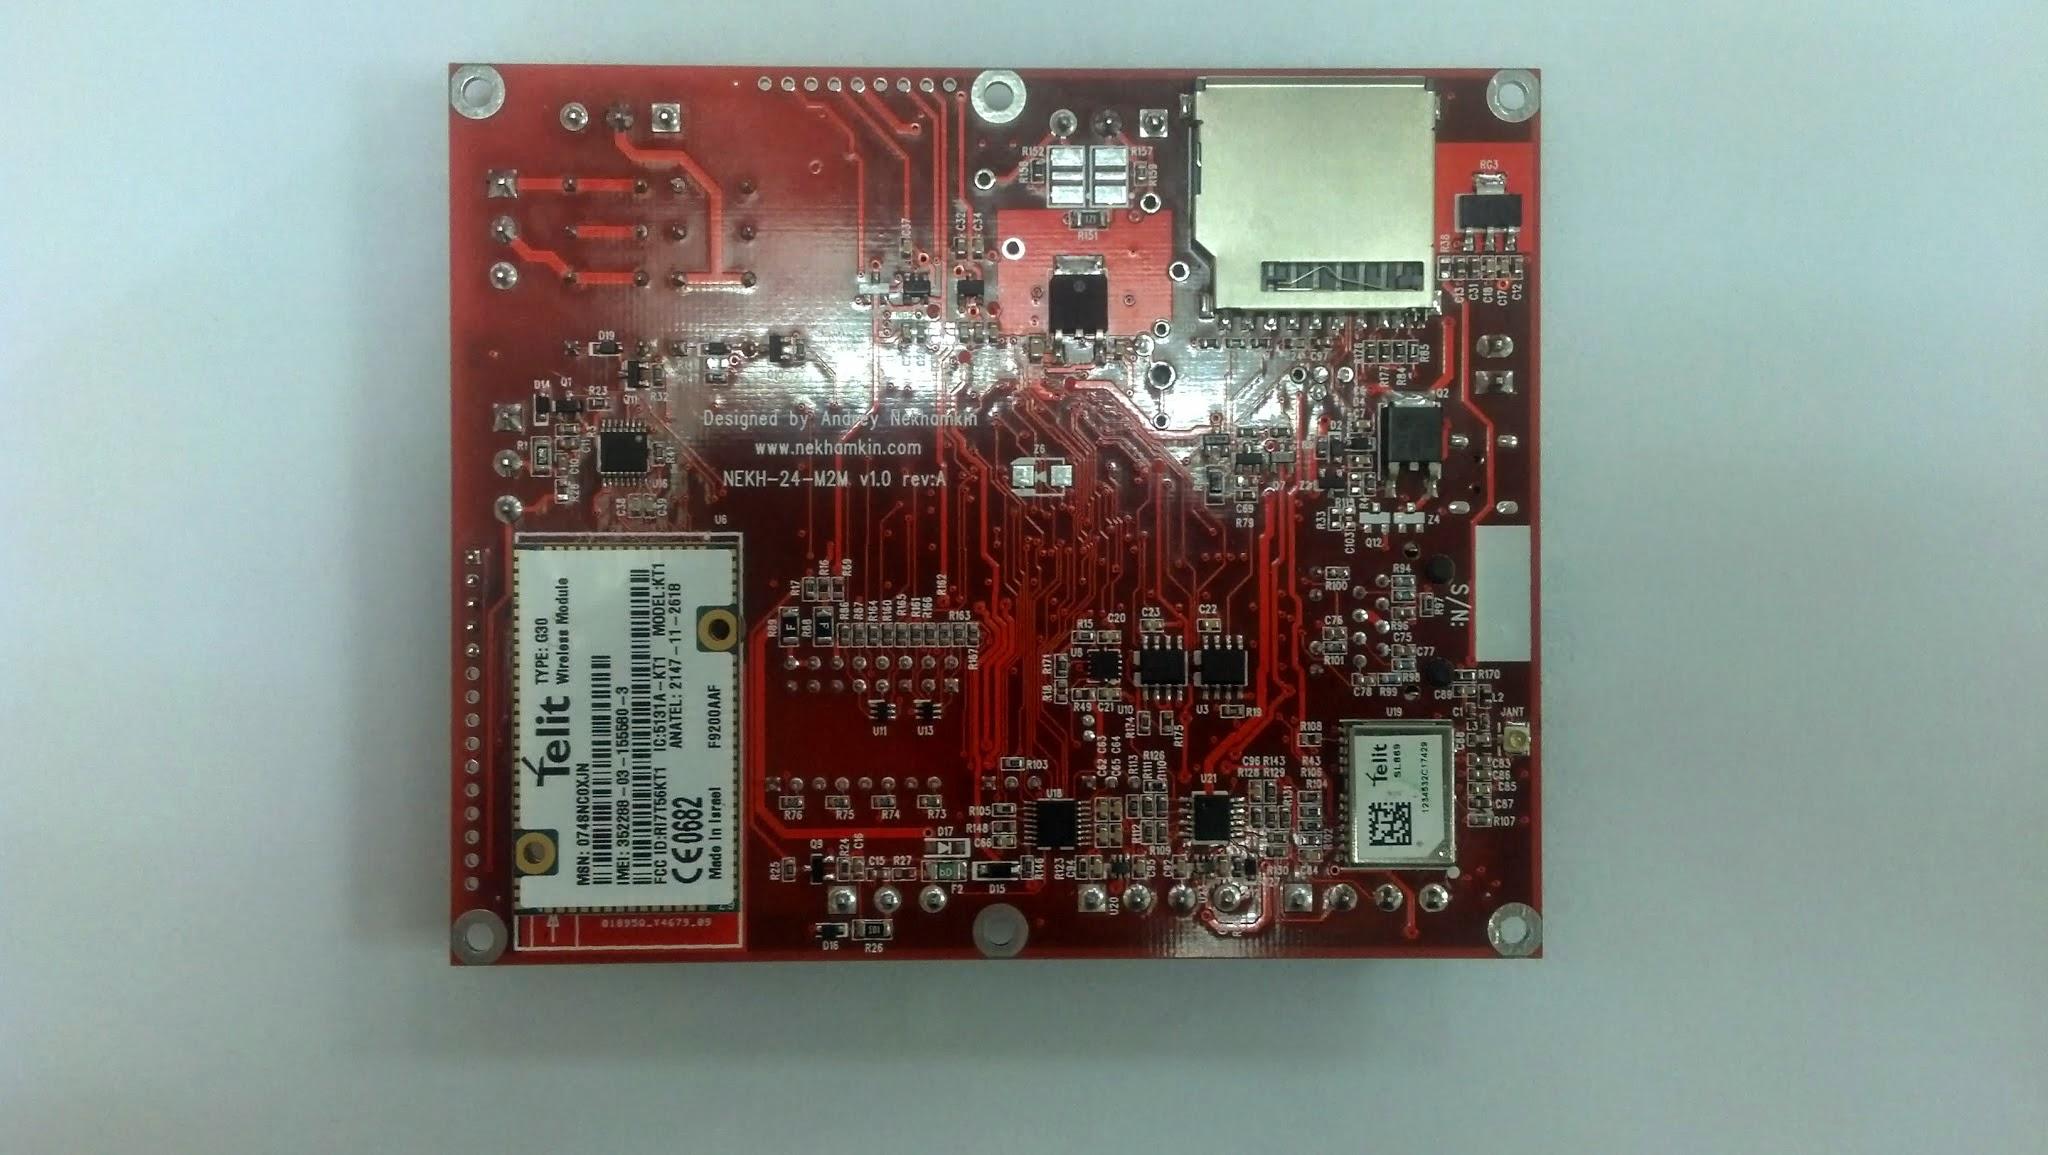 Link2M-U basic device (bottom)